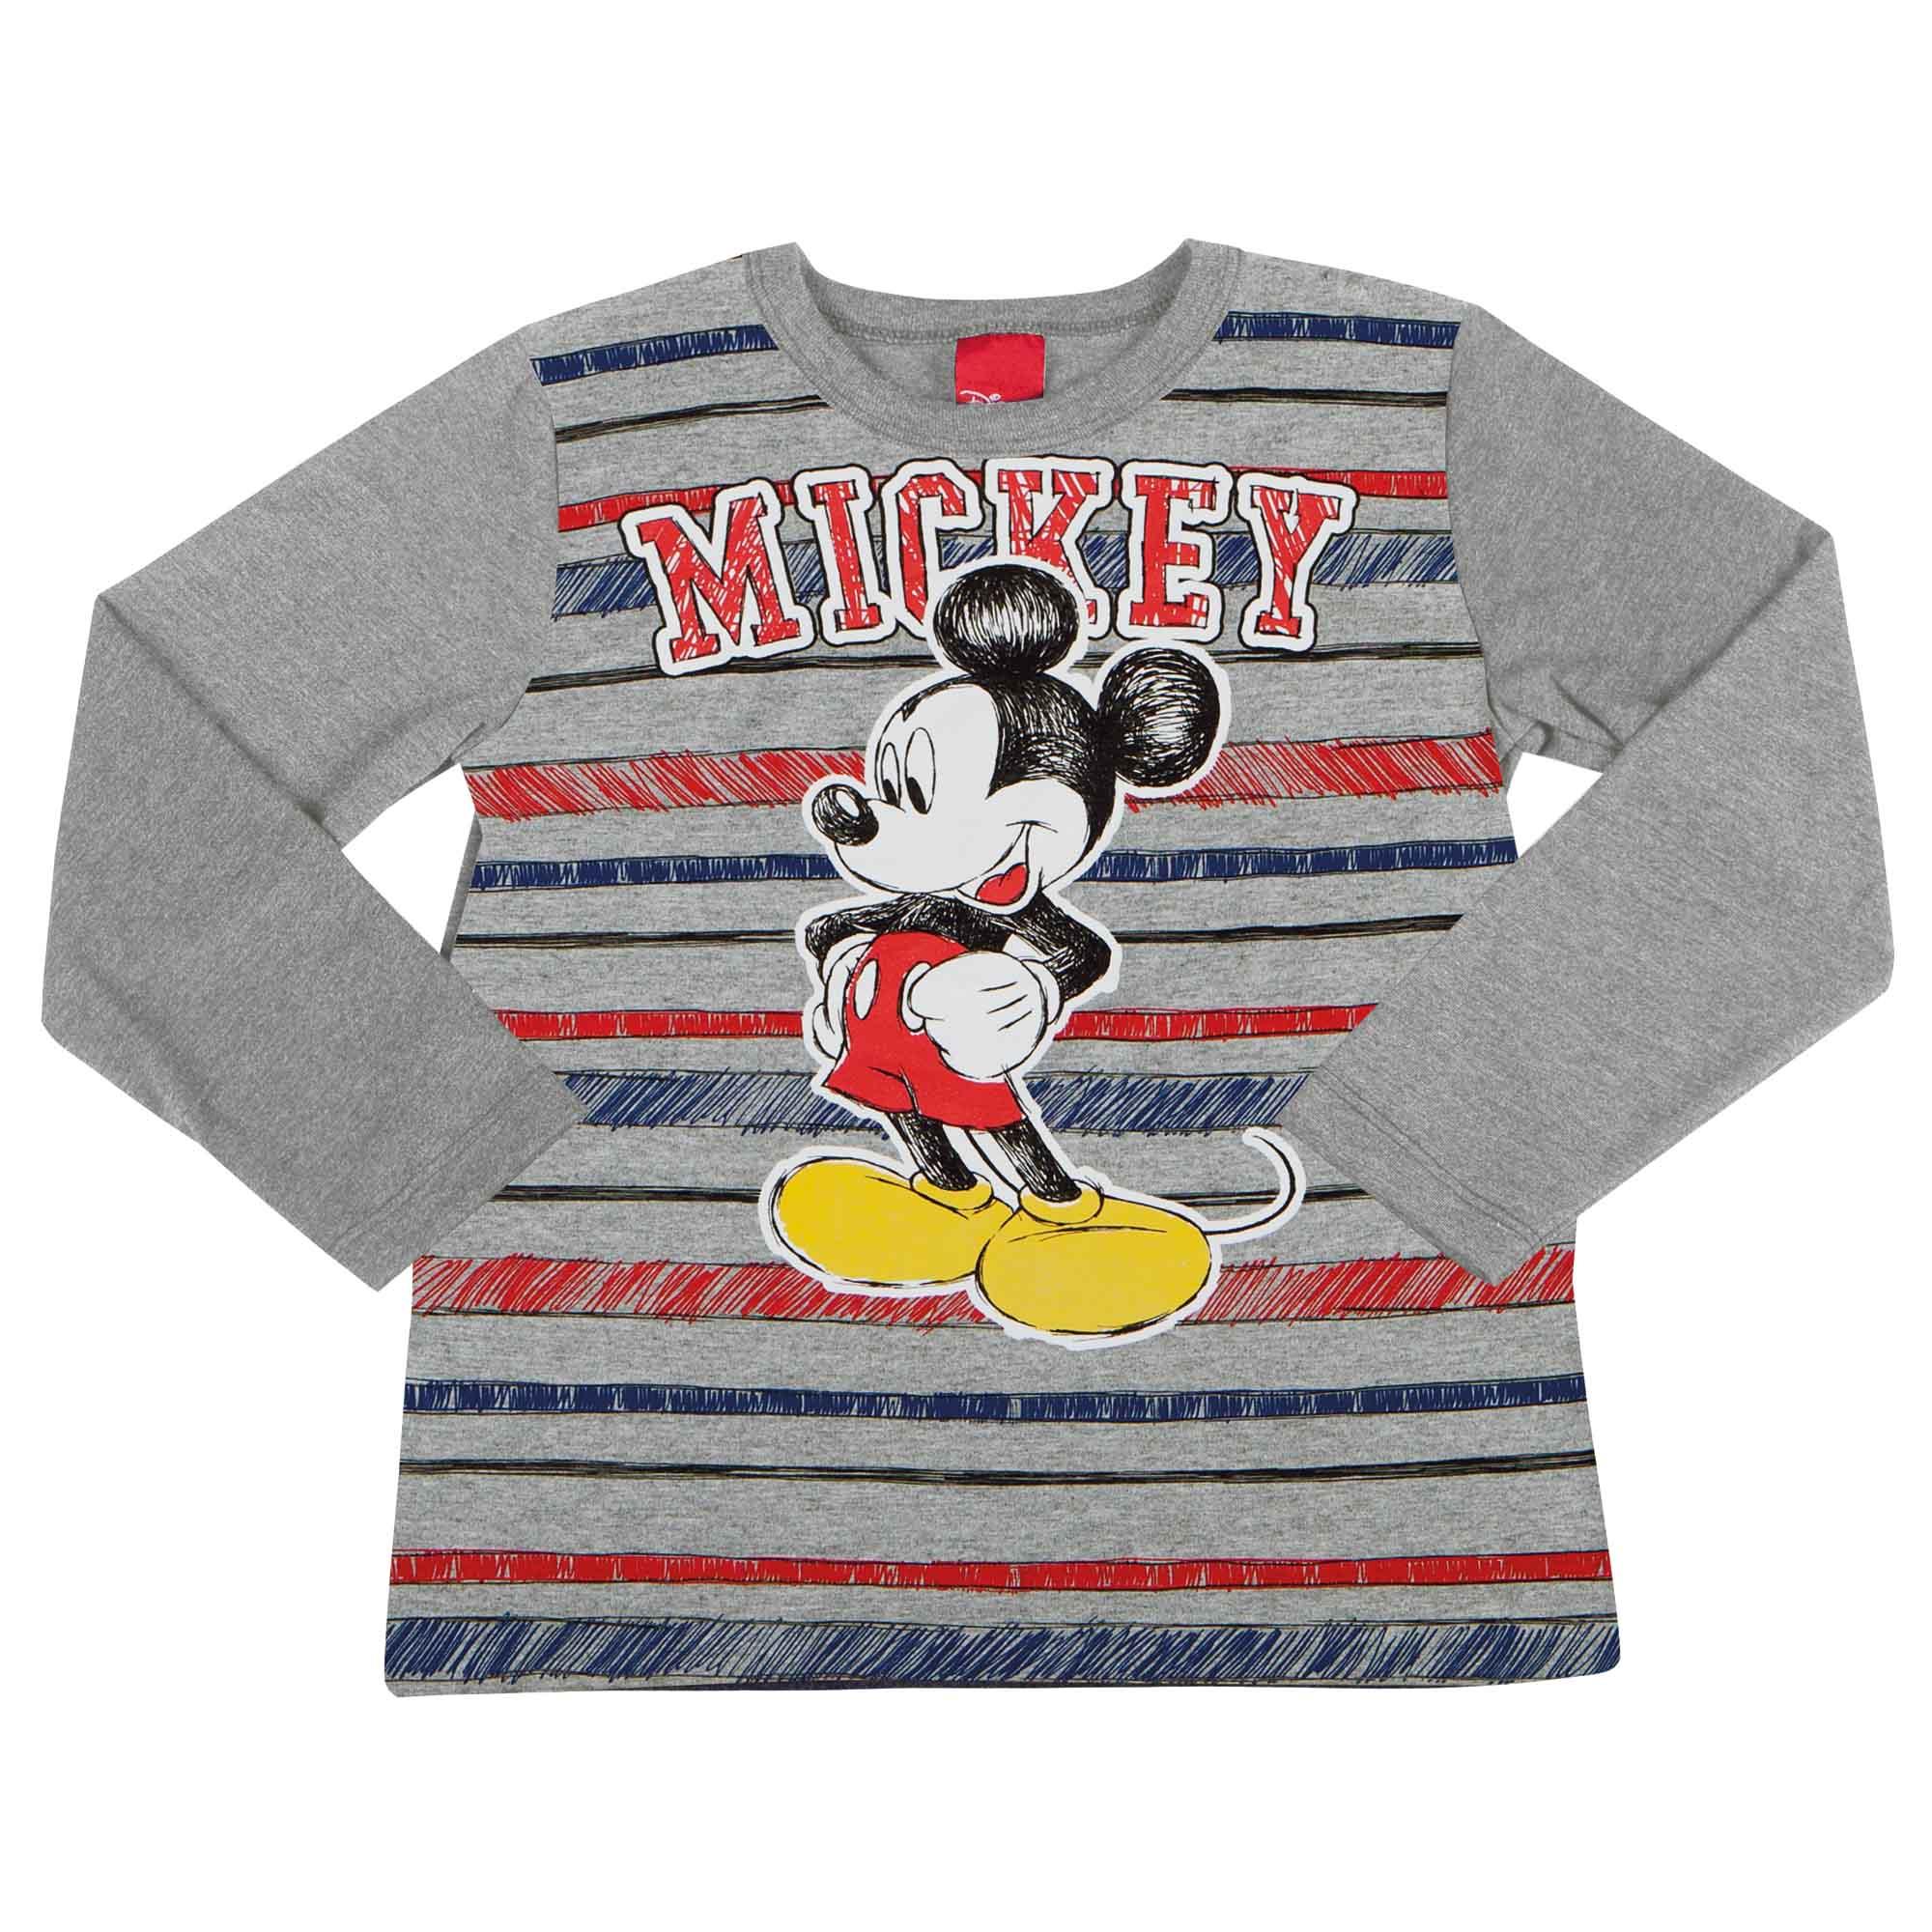 Camiseta Manga Longa Cativa Estampa Listras e Mickey - 4 ao 8